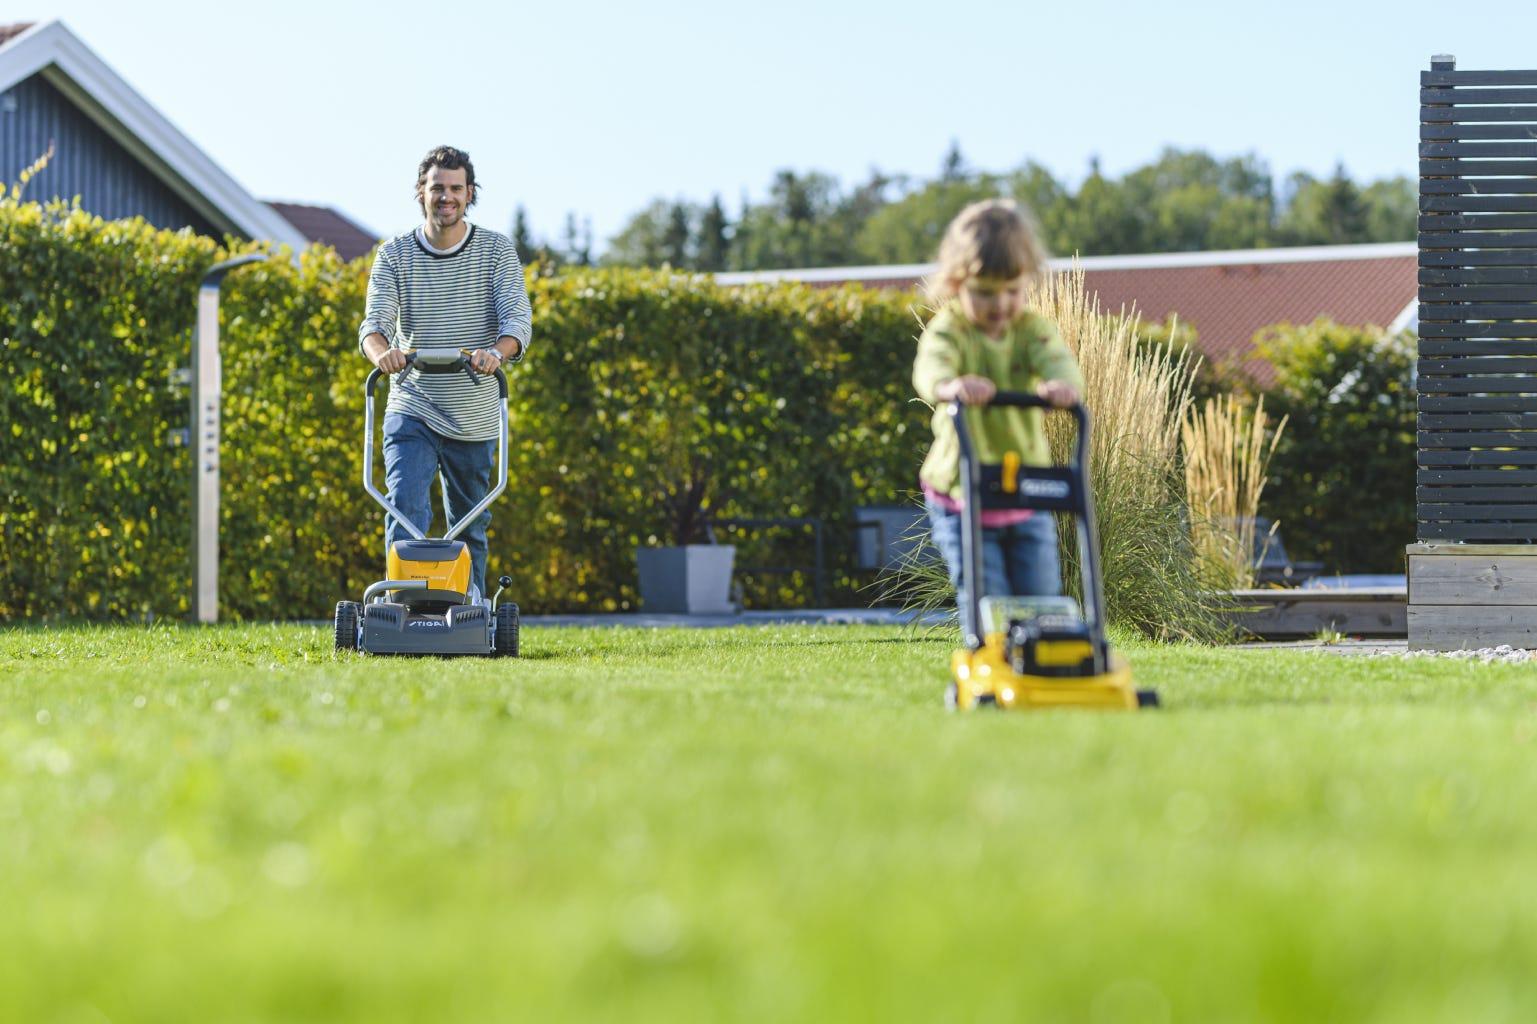 vader en dochter gras maaien met accumaaier en gele stiga speelgoed grasmaaier